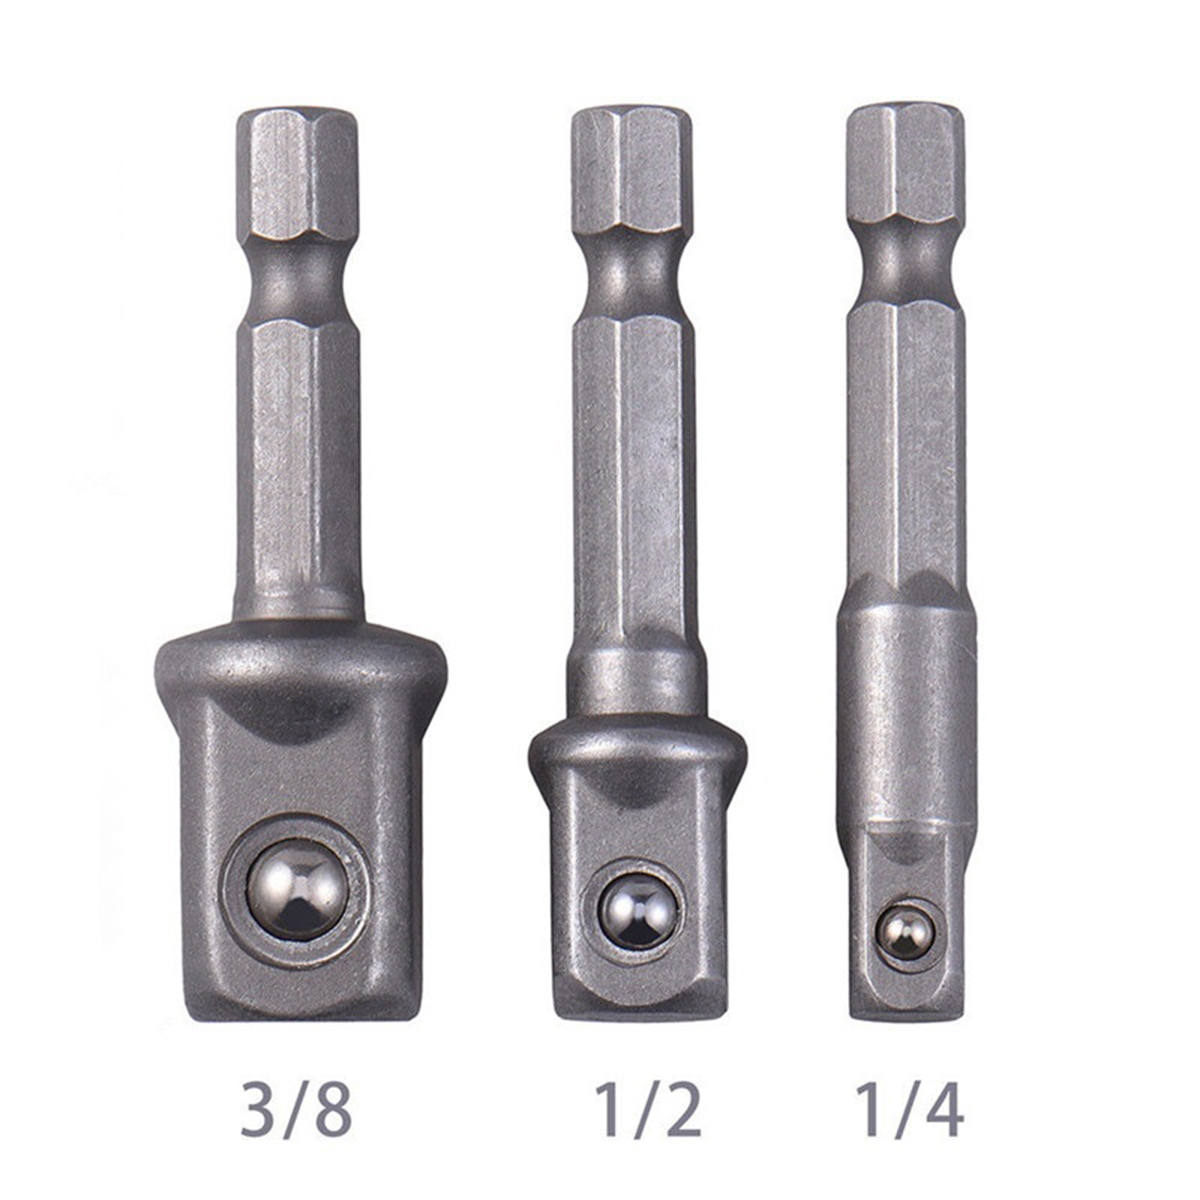 3pcs/Set Chrome Vanadium Steel Socket Adapter Hex Shank To 1/4